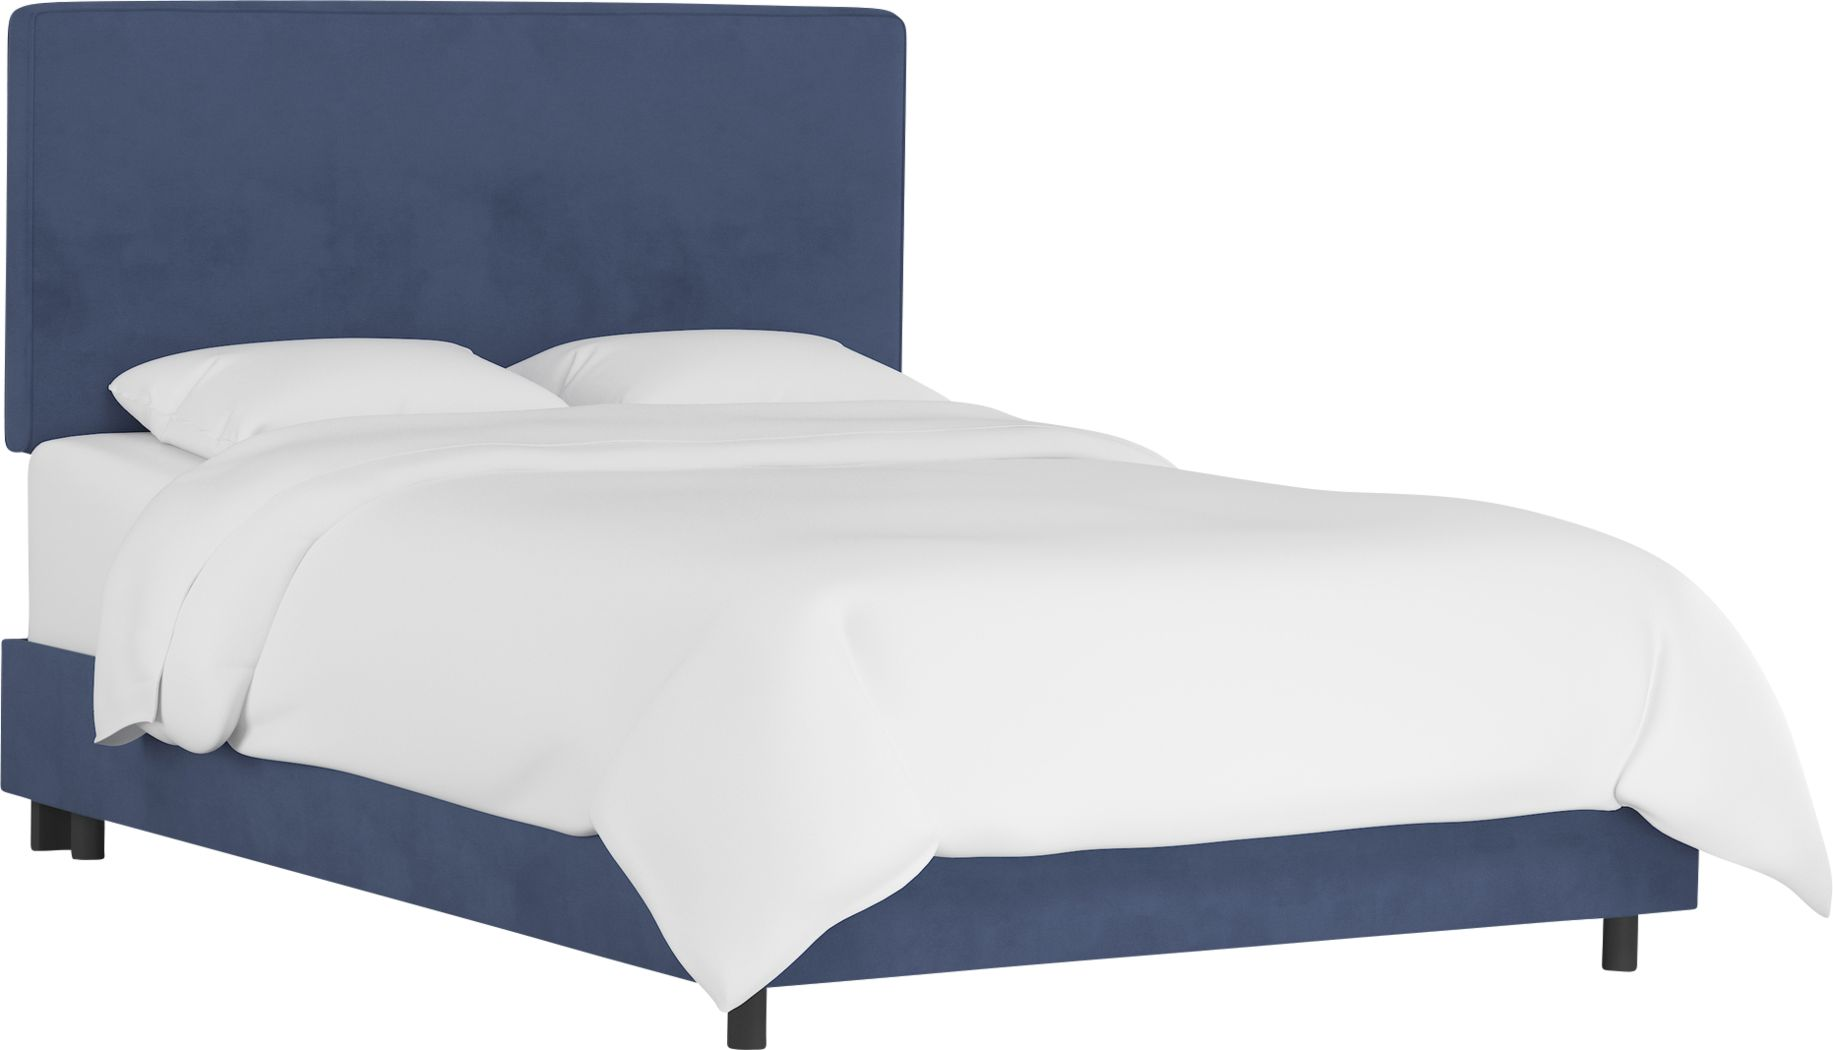 Tangere Blue King Upholstered Bed